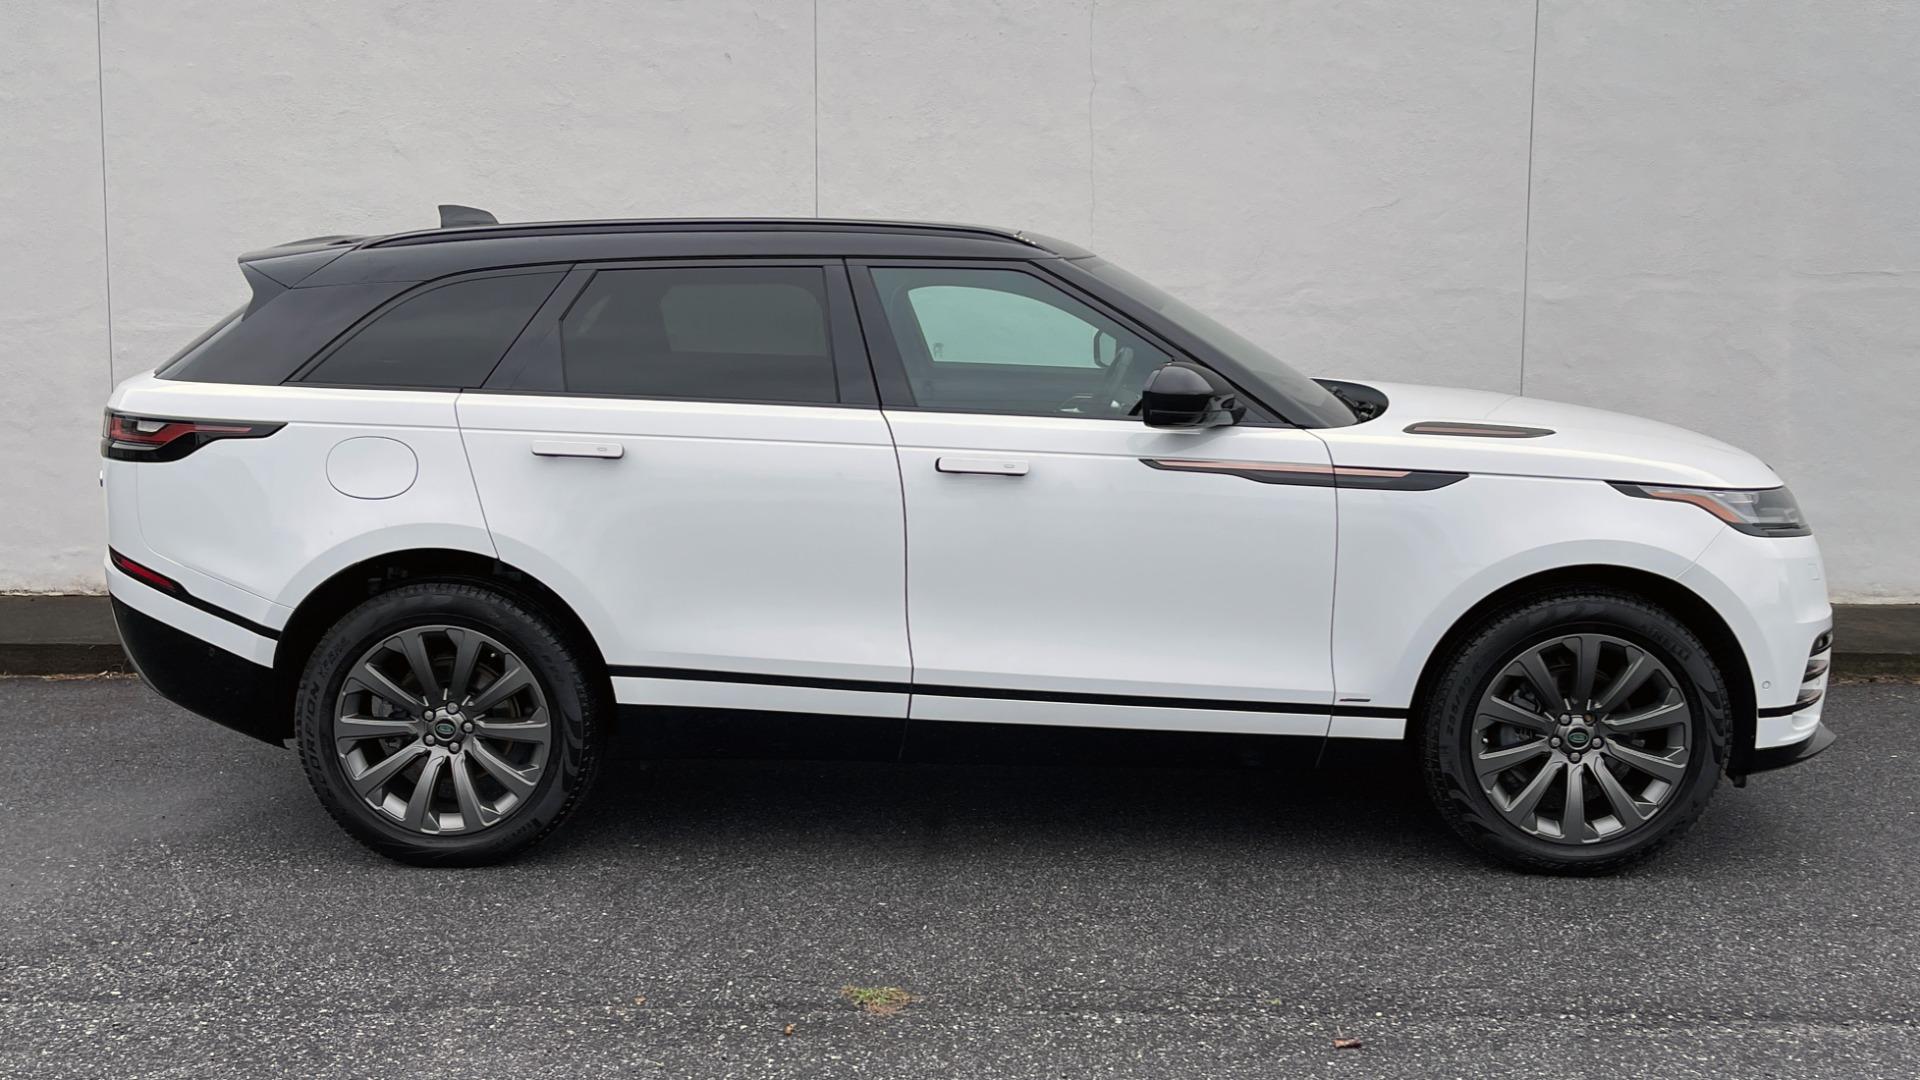 Used 2018 Land Rover RANGE ROVER VELAR R-DYNAMIC SE / NAV / PREM / MERIDIAN / SUNROOF / REARVIEW for sale $54,995 at Formula Imports in Charlotte NC 28227 5